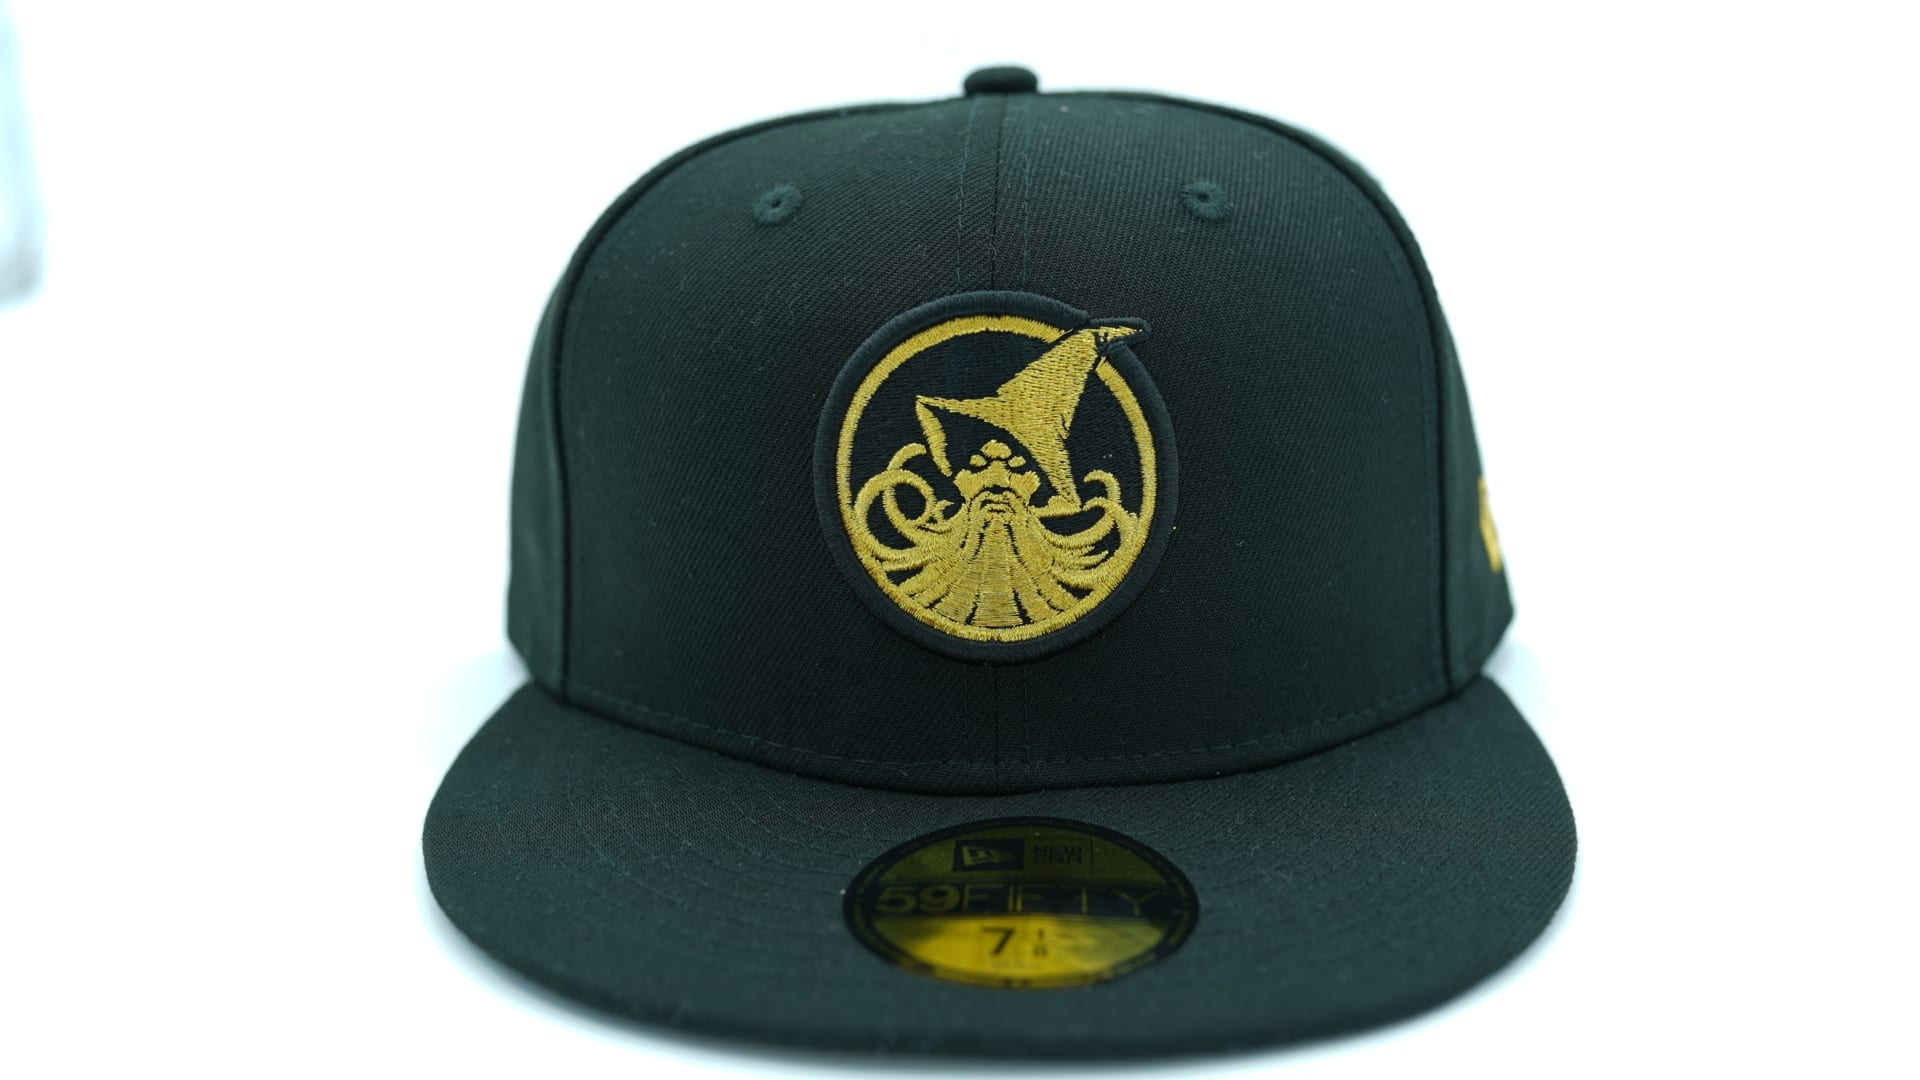 boston red sox hamilton franchise fitted baseball cap carhartt 47 brand mlb  1 751a56d702b